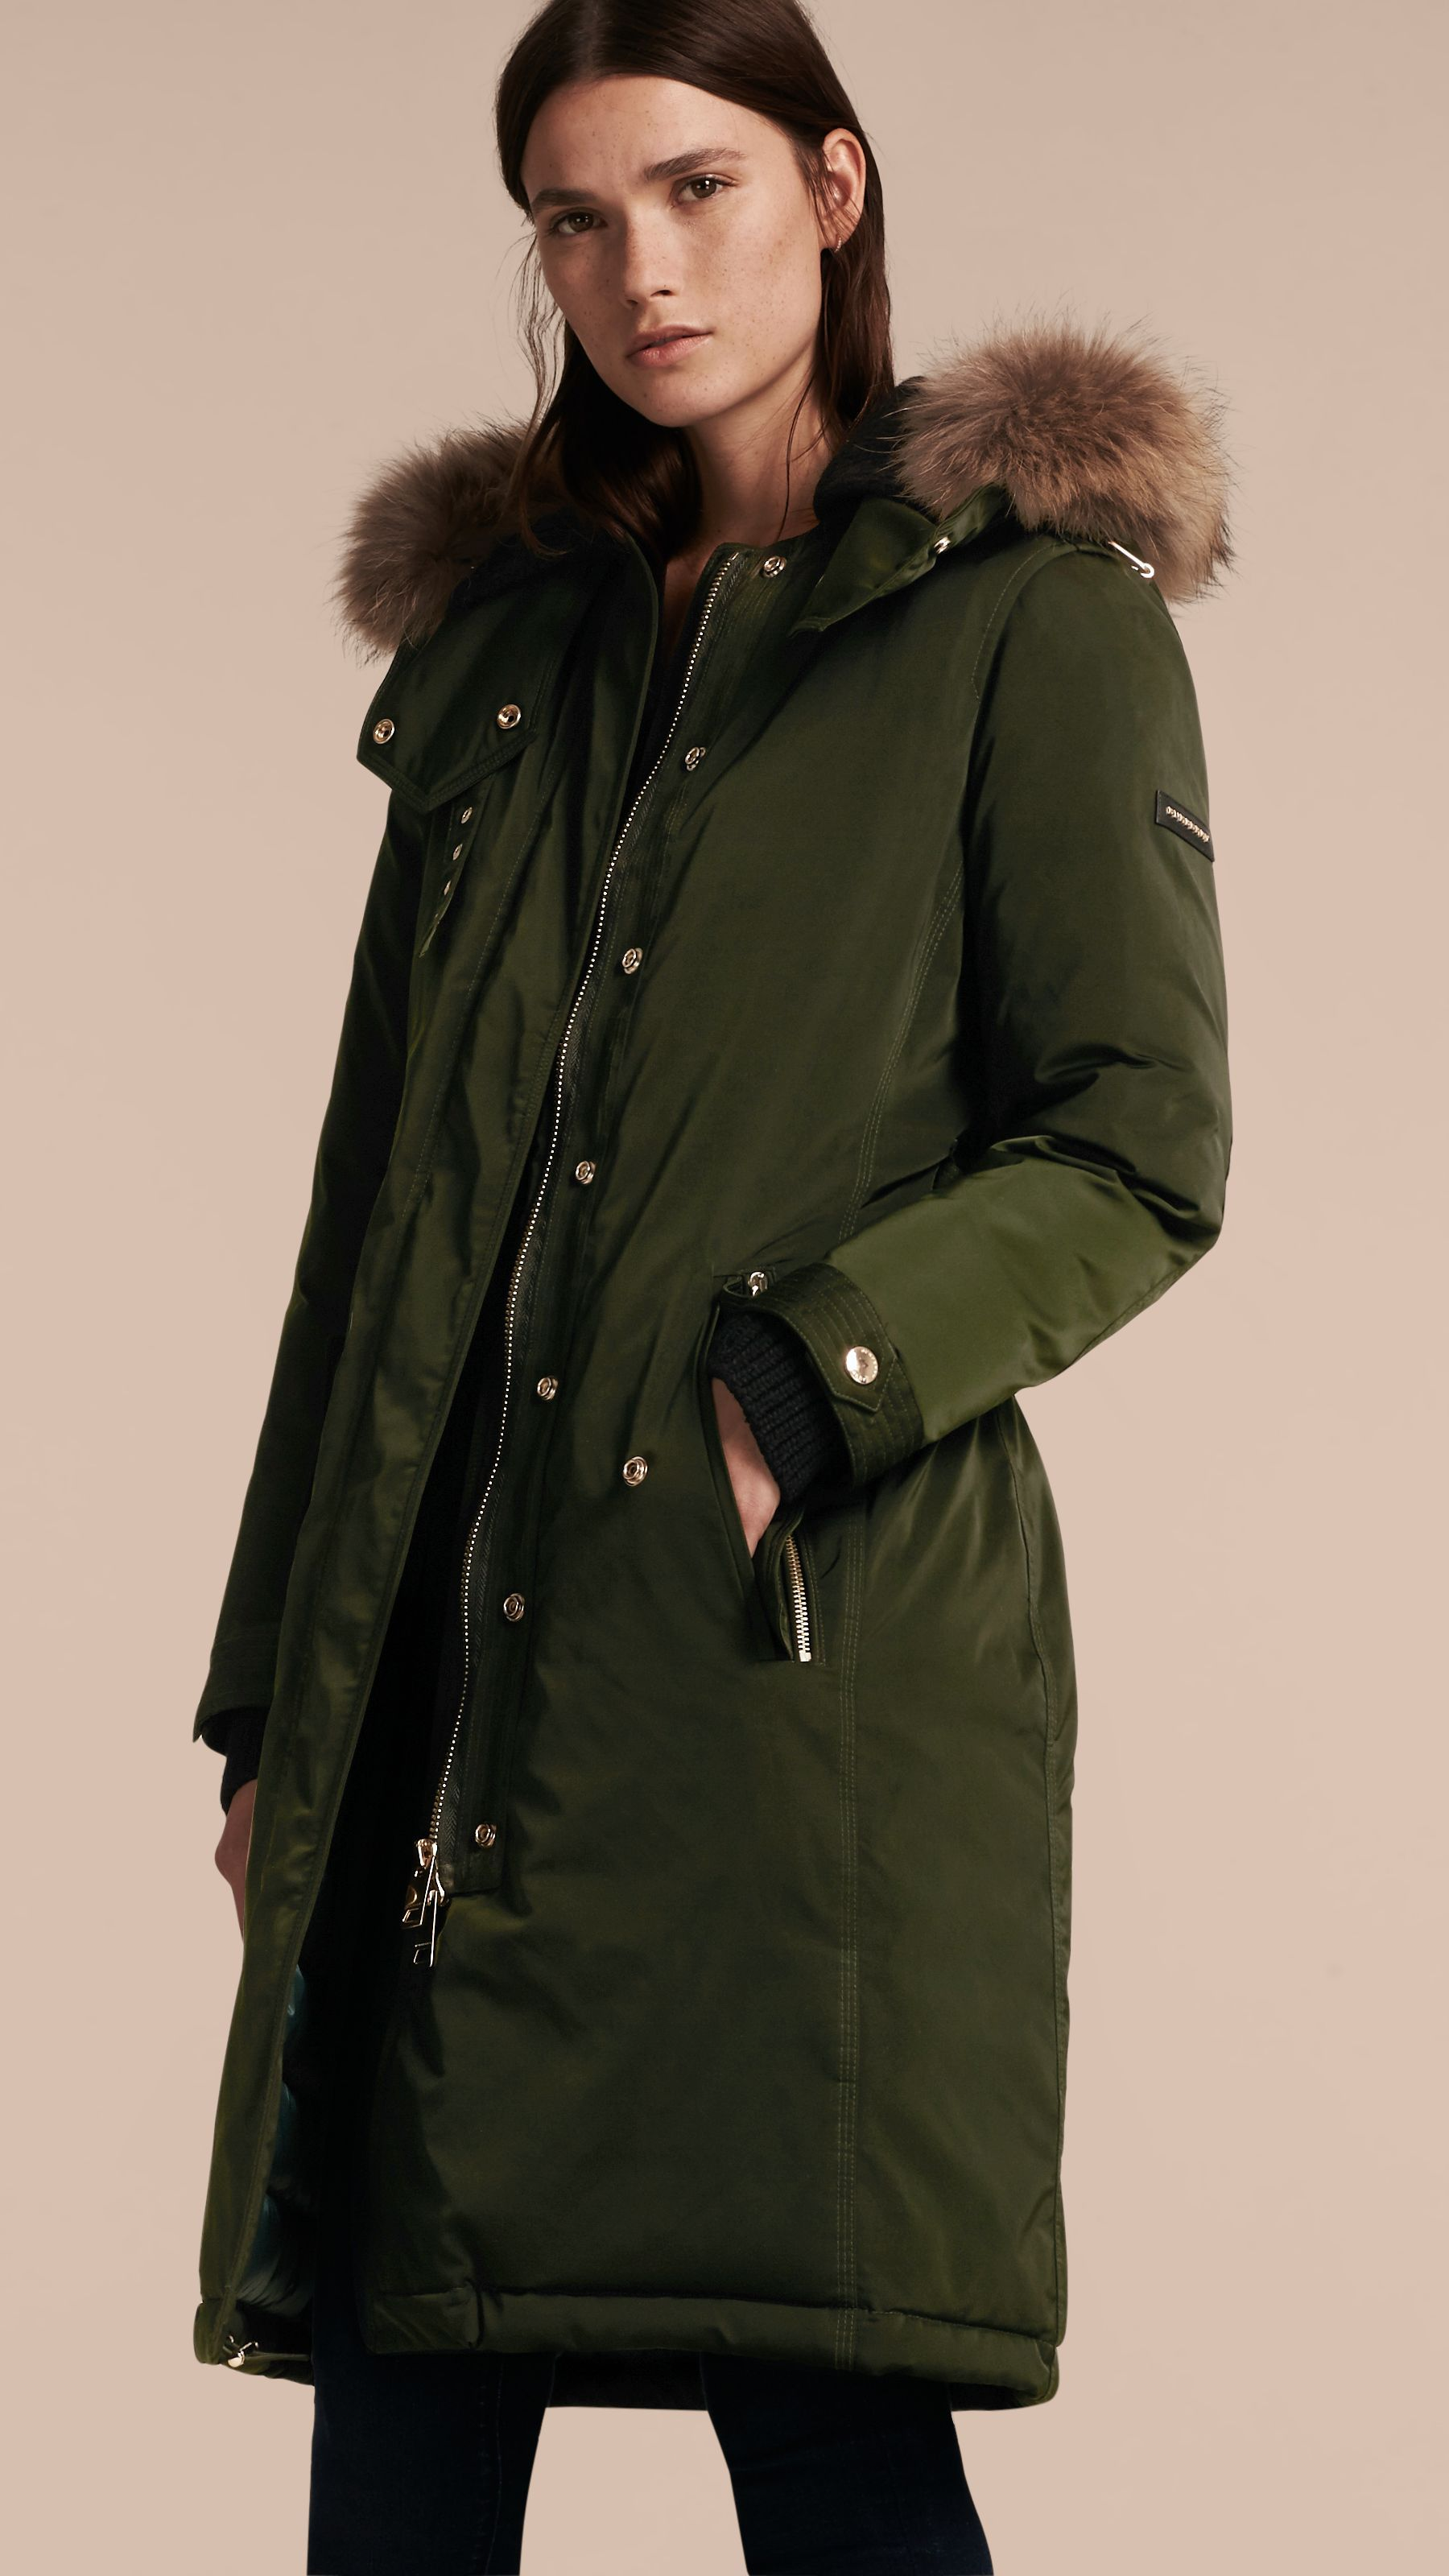 Down-filled Parka Coat with Detachable Fur Trim in Dark Cedar Green - Women  |